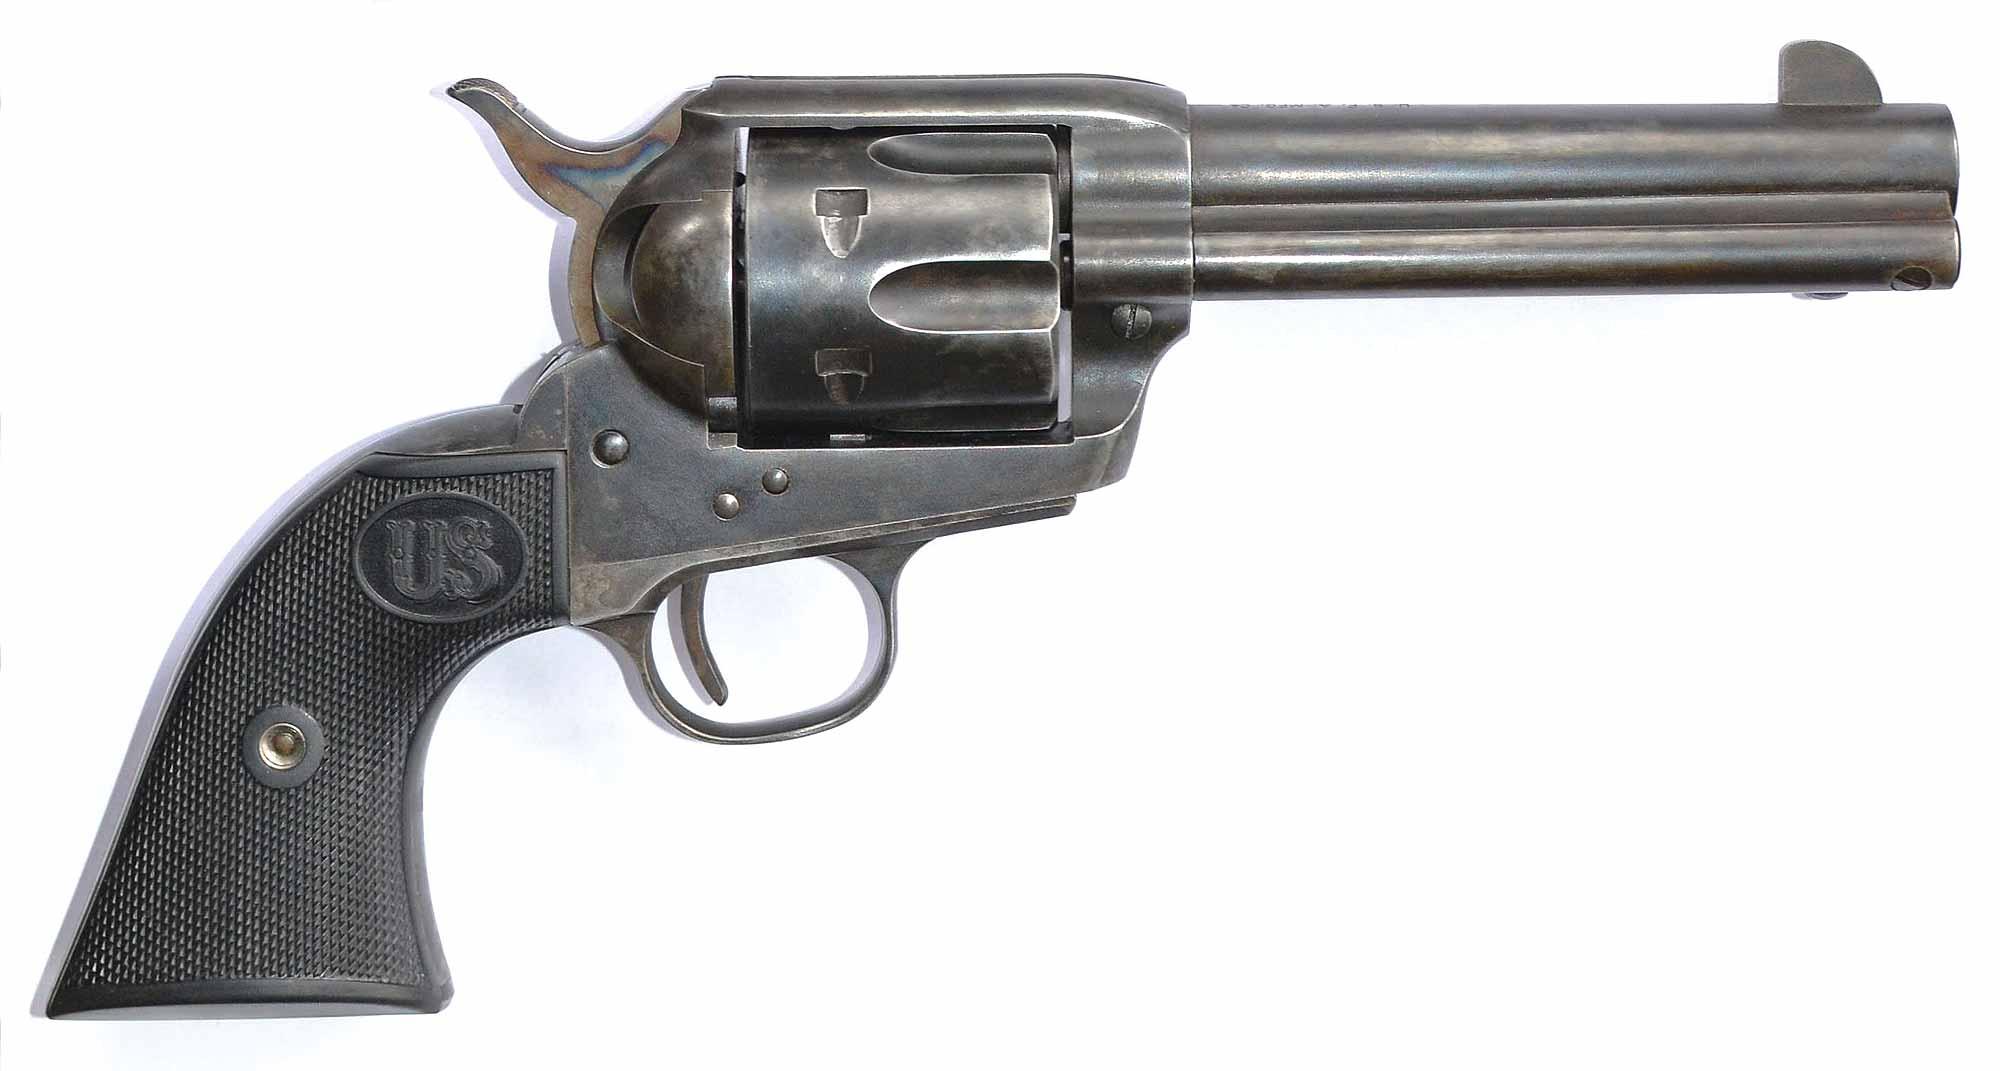 USFA-Antiqued-45-Colt.jpg